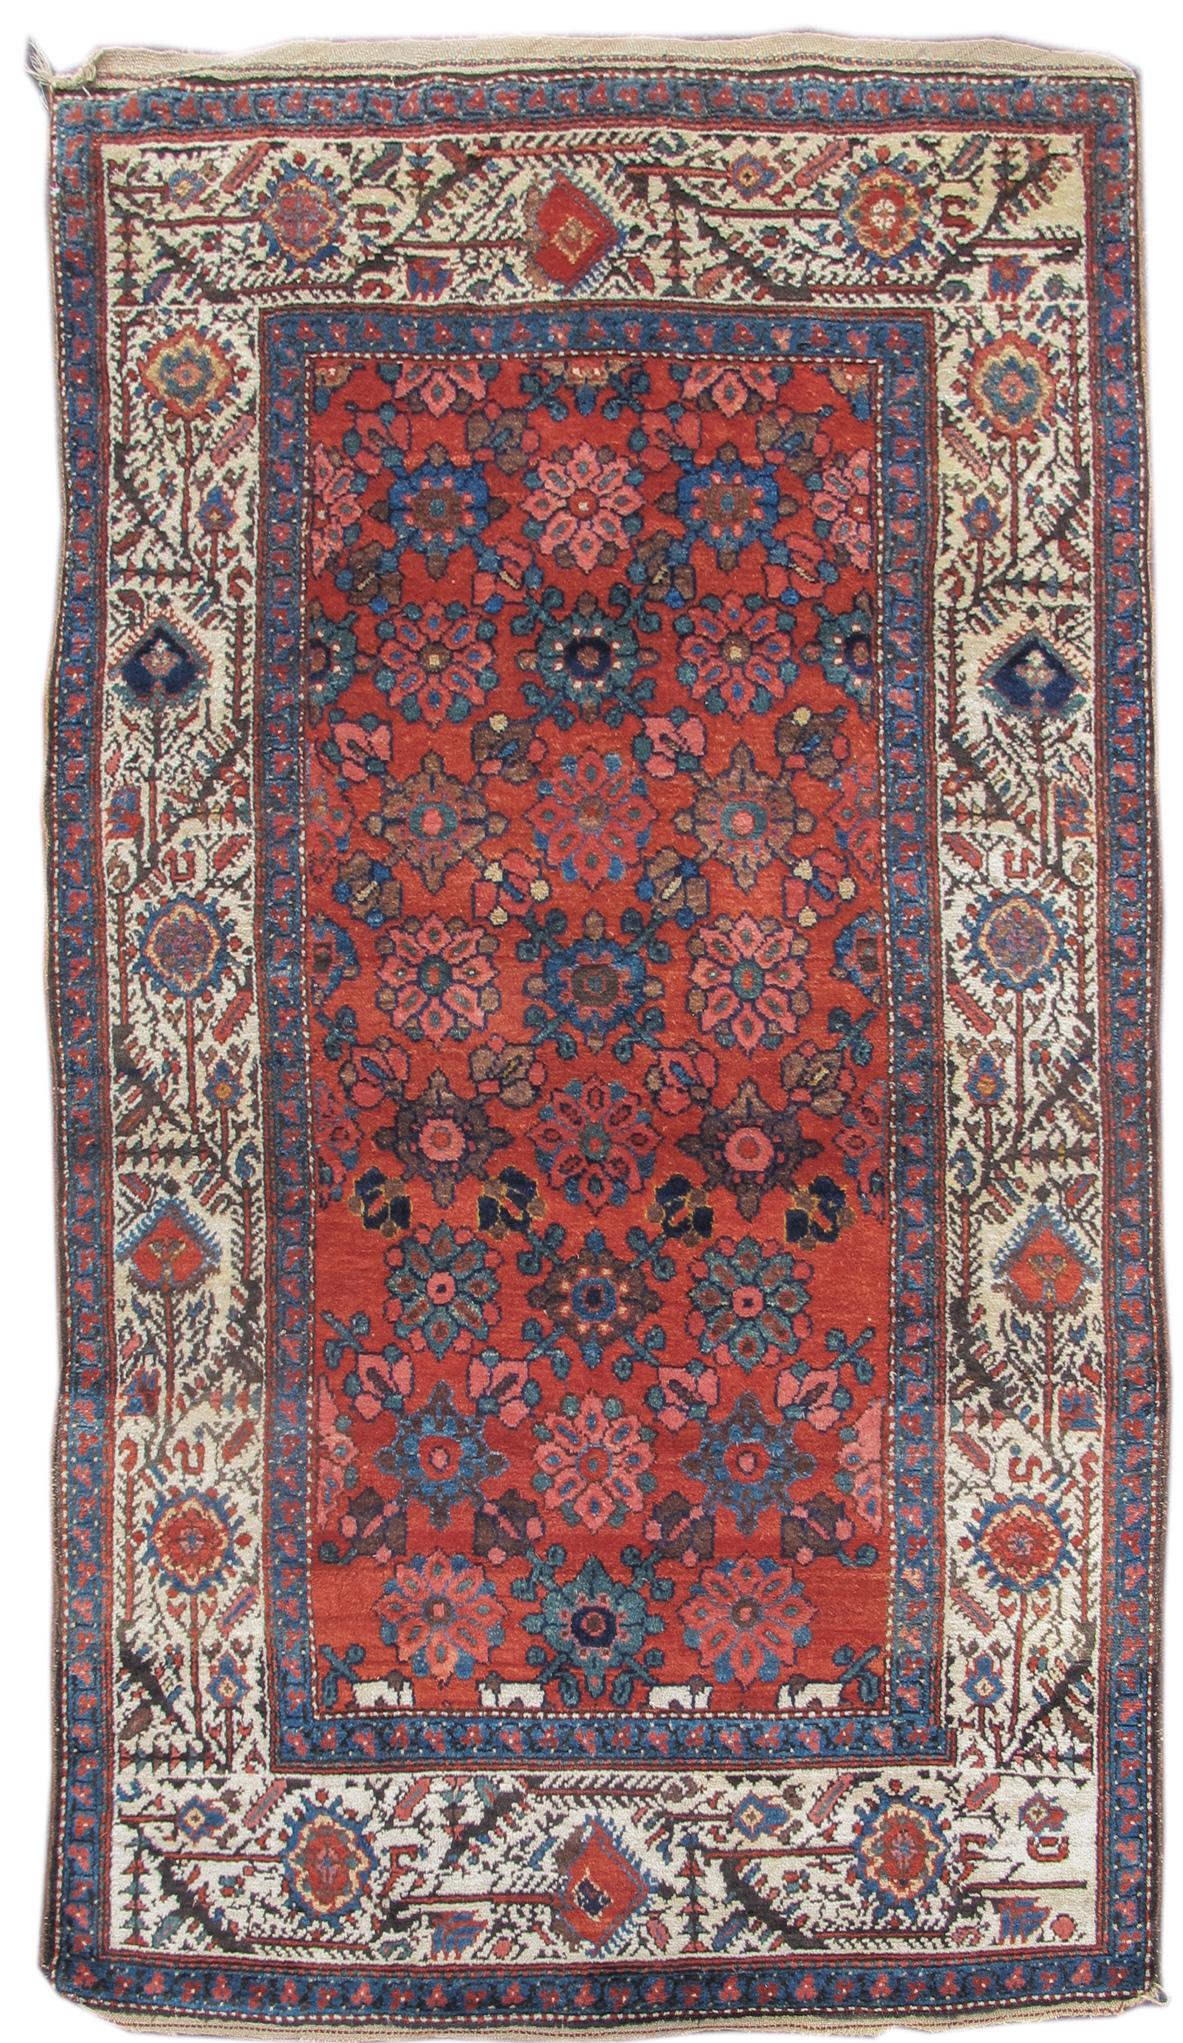 Kurdish village rug